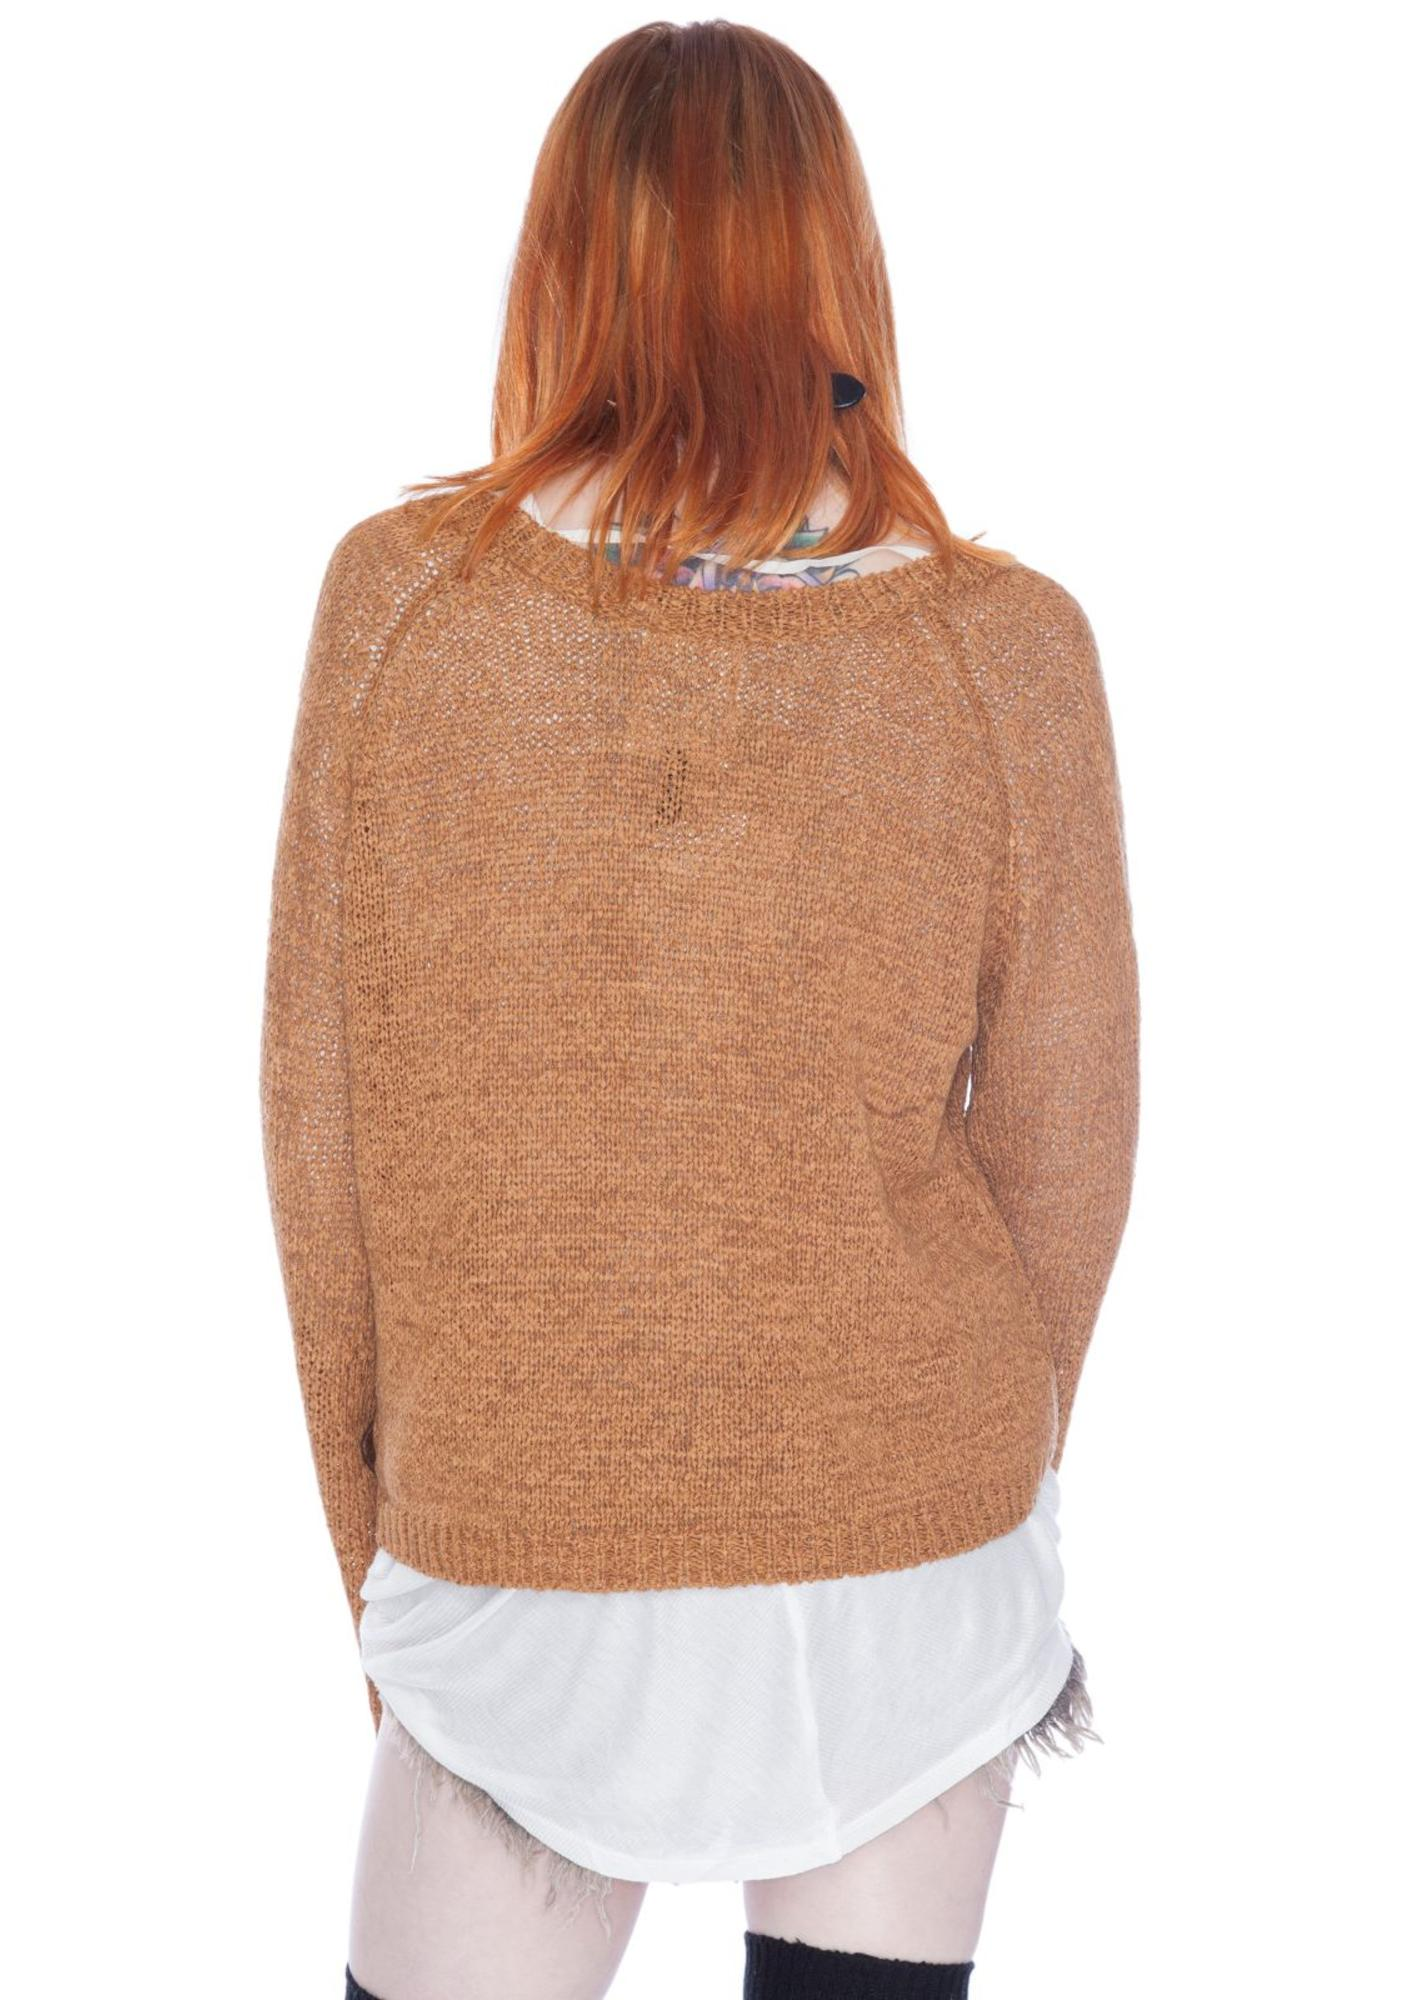 One Teaspoon Euphoria Knit Top